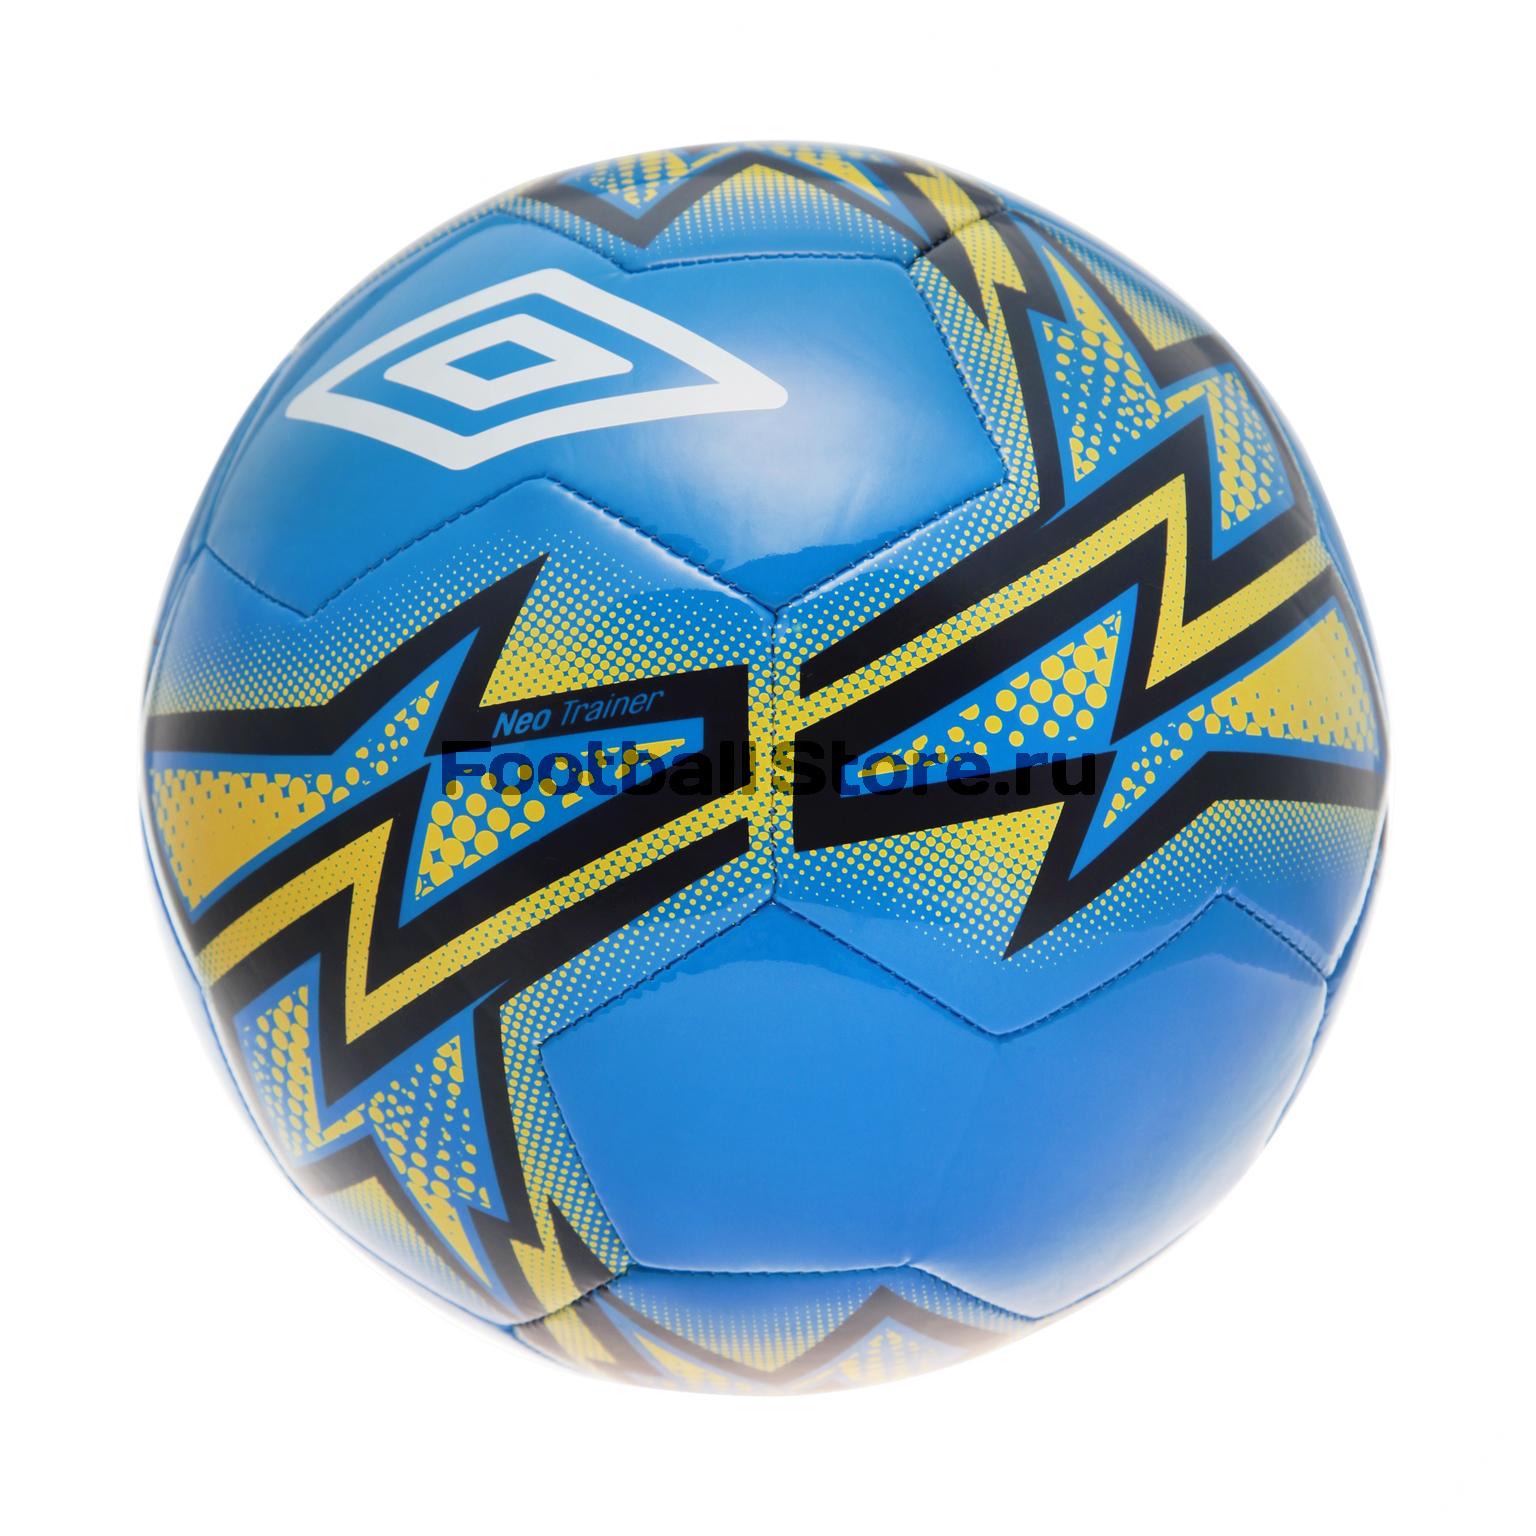 Футбольный мяч Umbro Trainer 20877U мяч футбольный любительский р 5 umbro veloce supporter 20808u stt